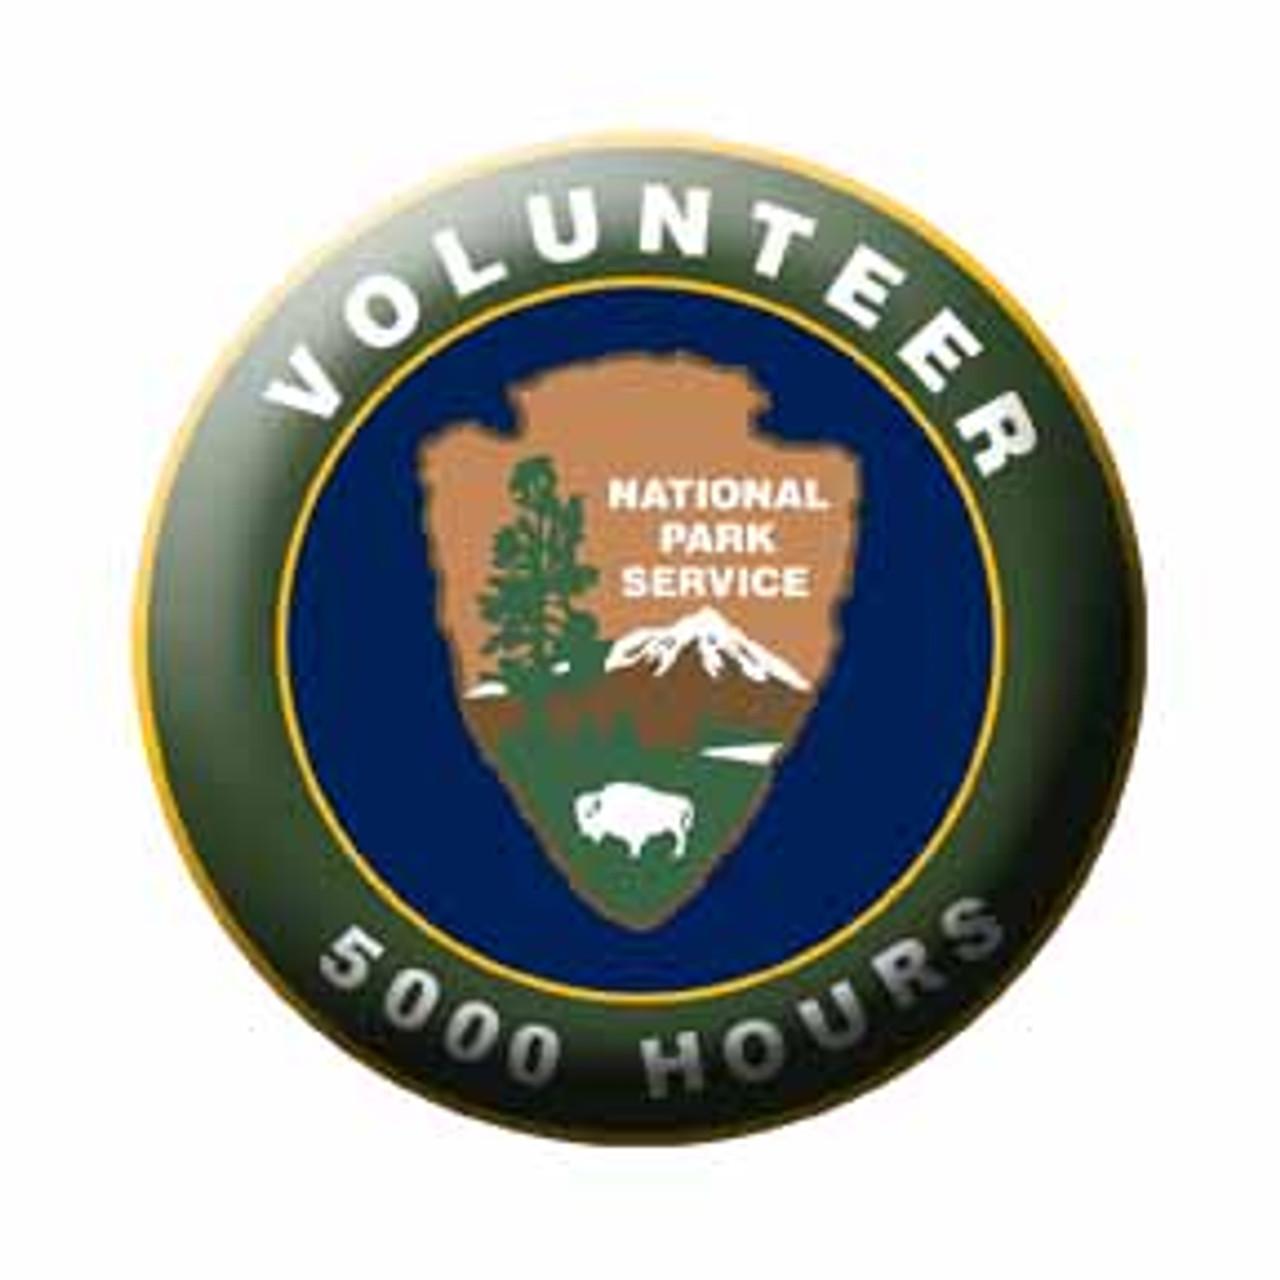 National Park Service Volunteer Hour Pins (1750 hours)